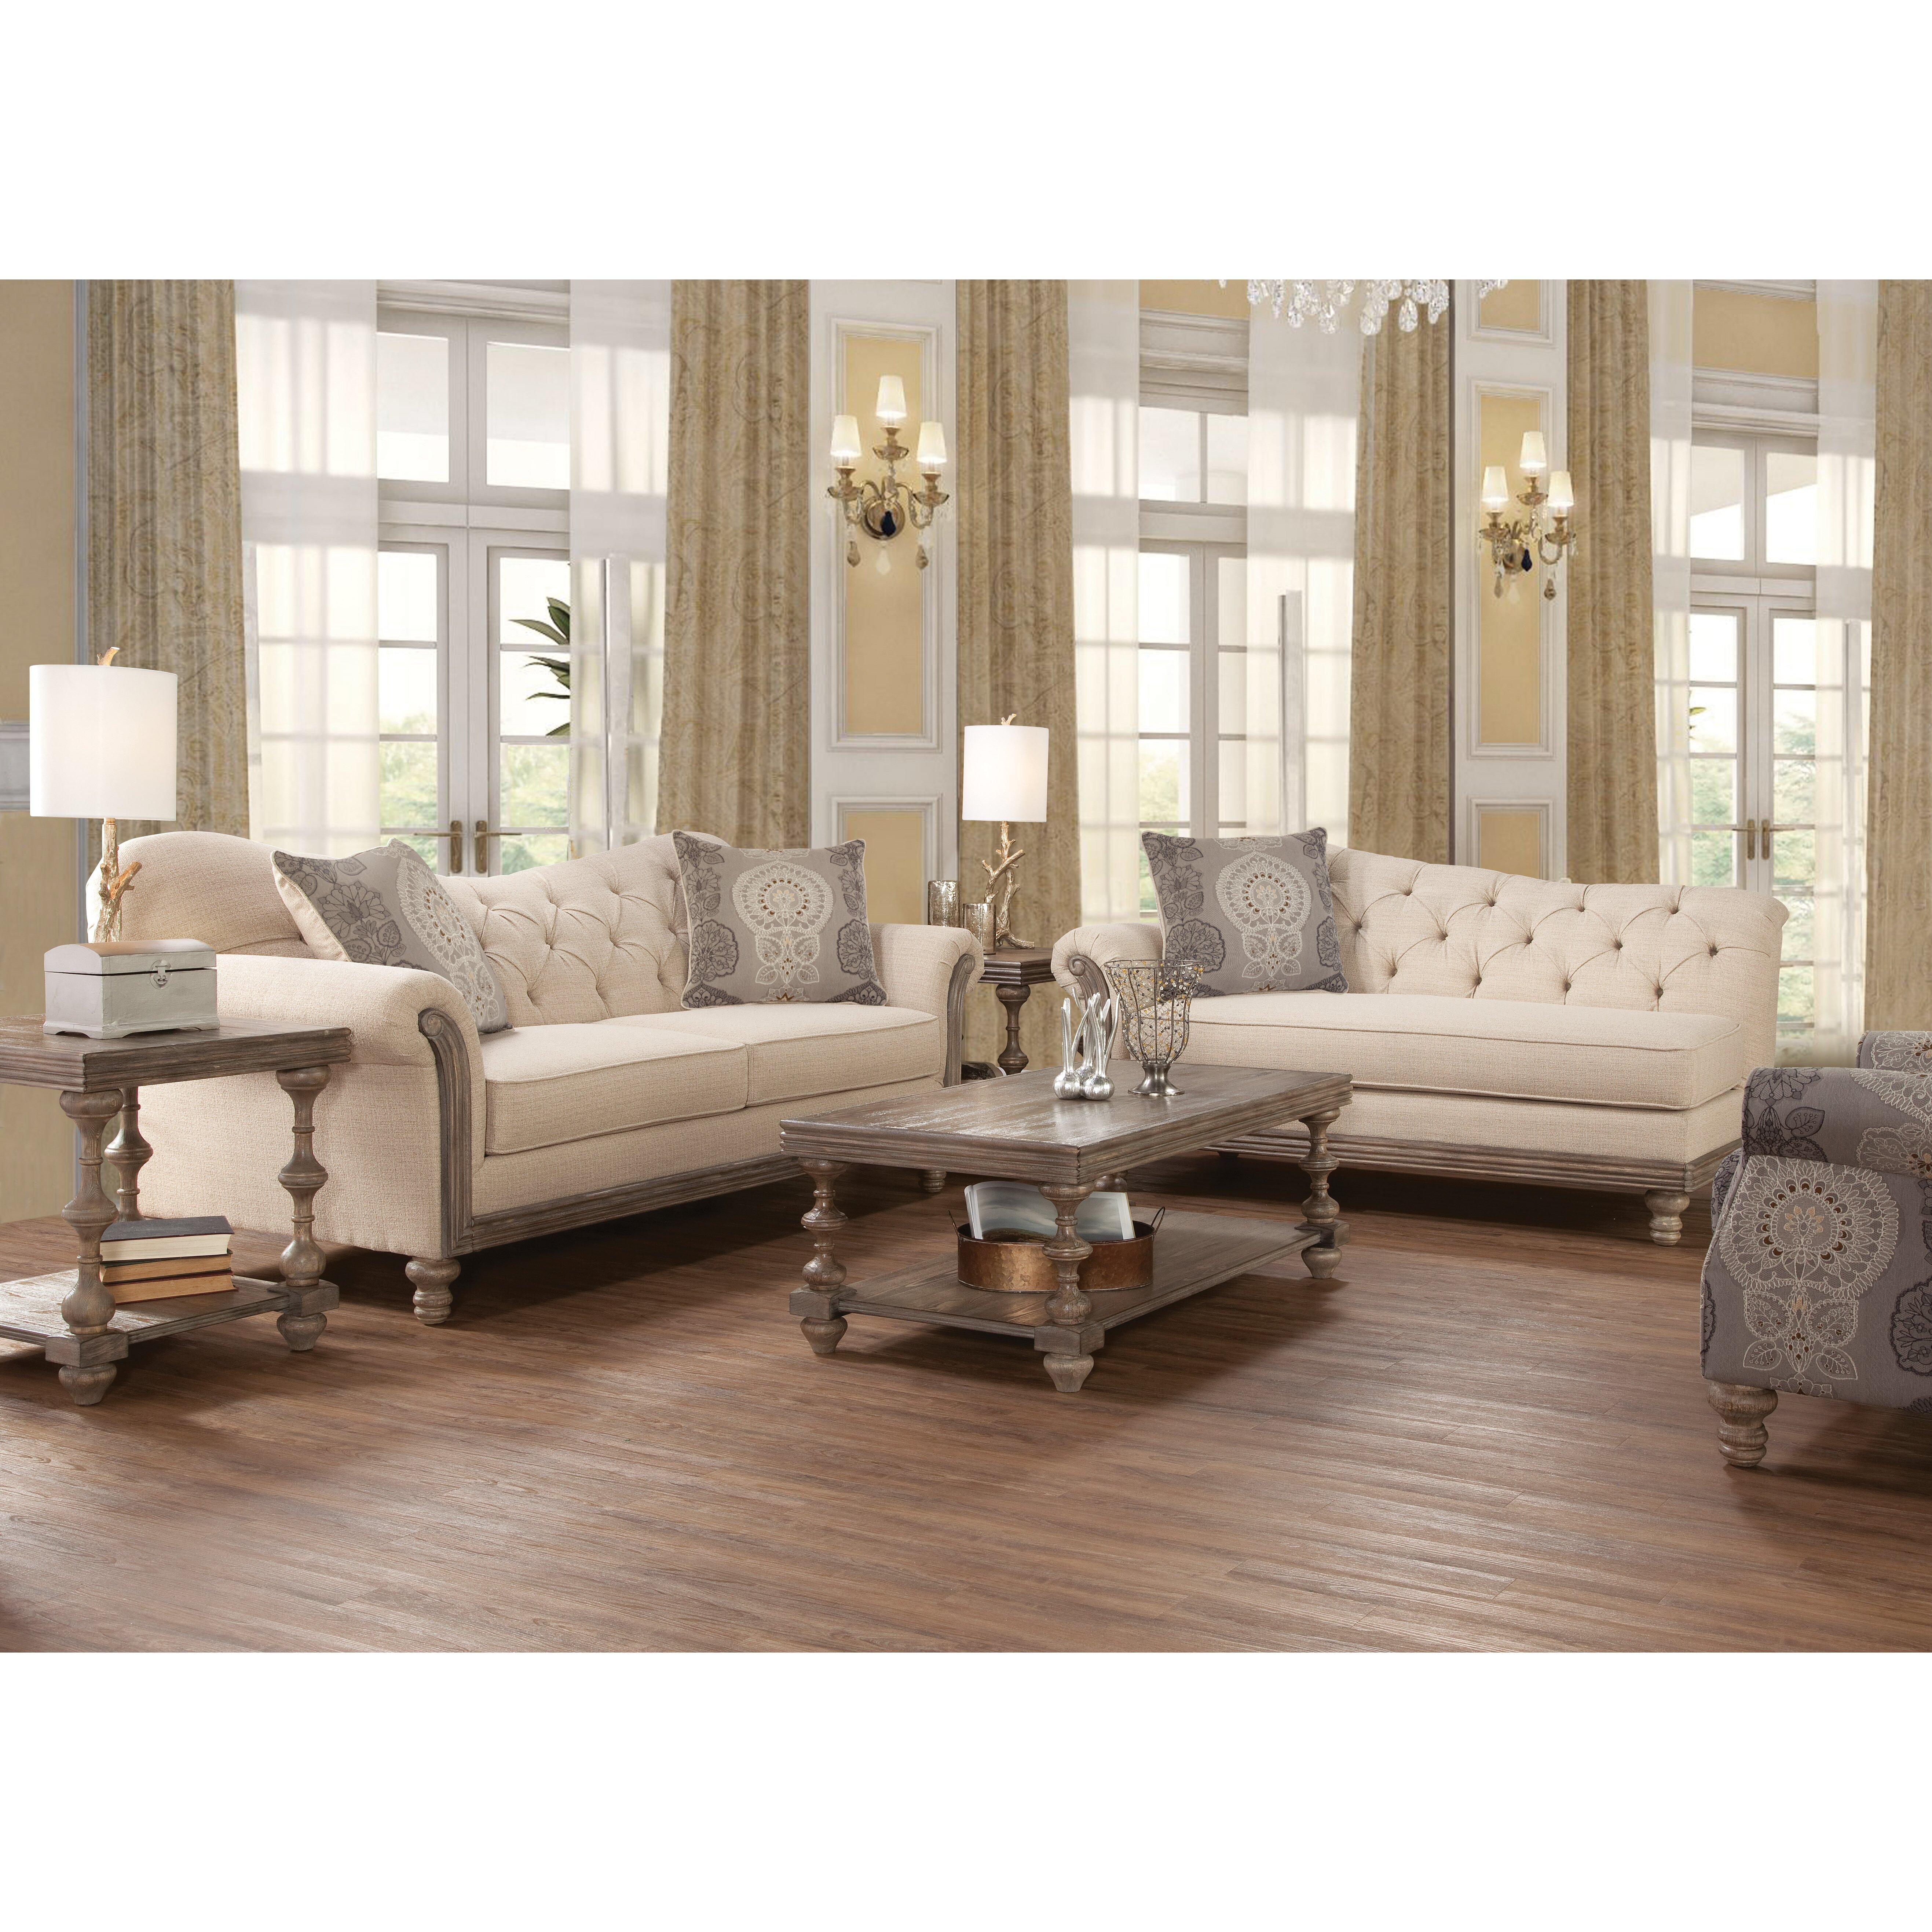 Bungalow rose serta upholstery roosa sofa